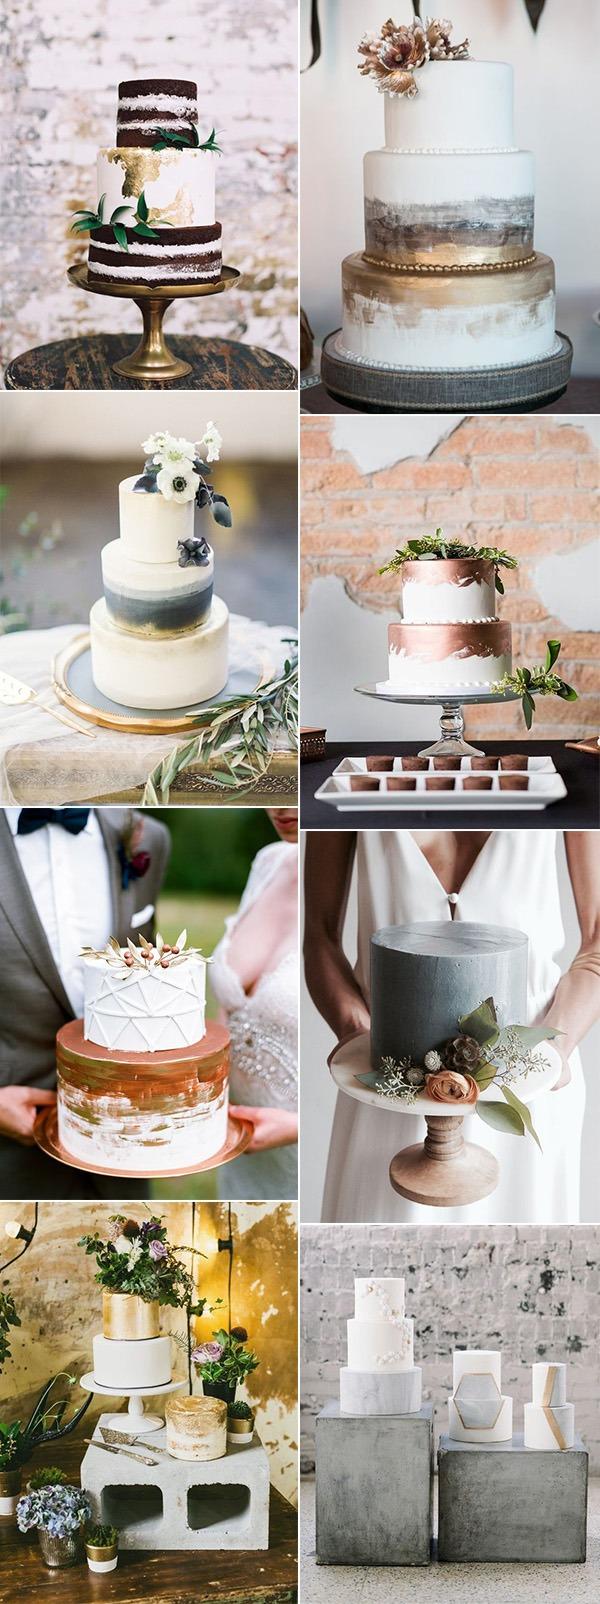 trending industrial wedding cake ideas